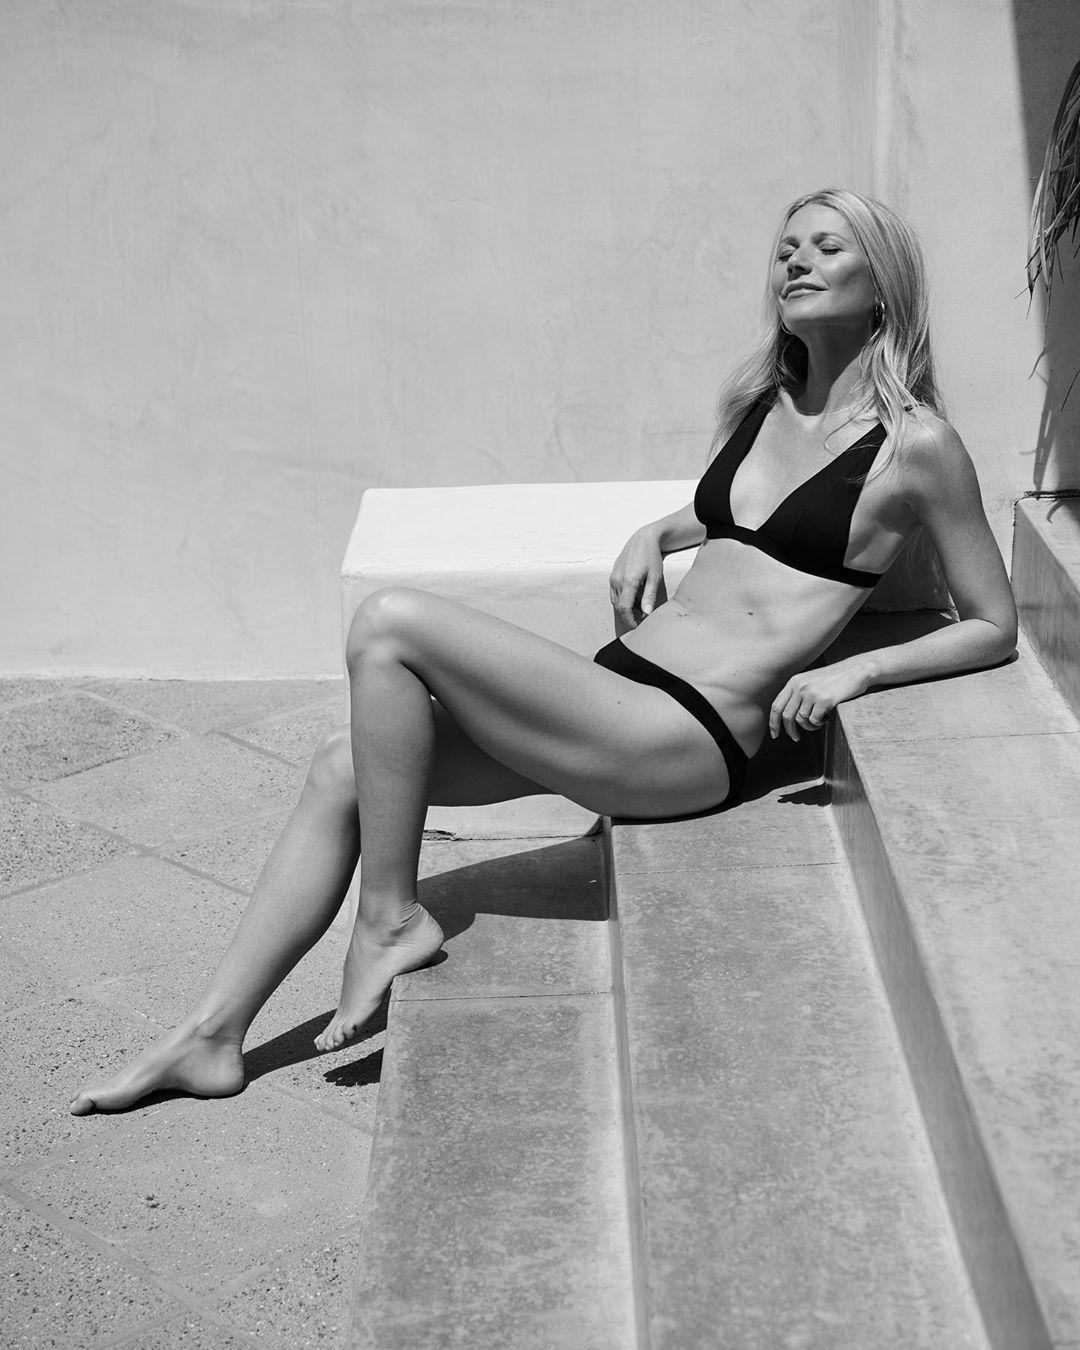 body bikini Gwenth paltrow